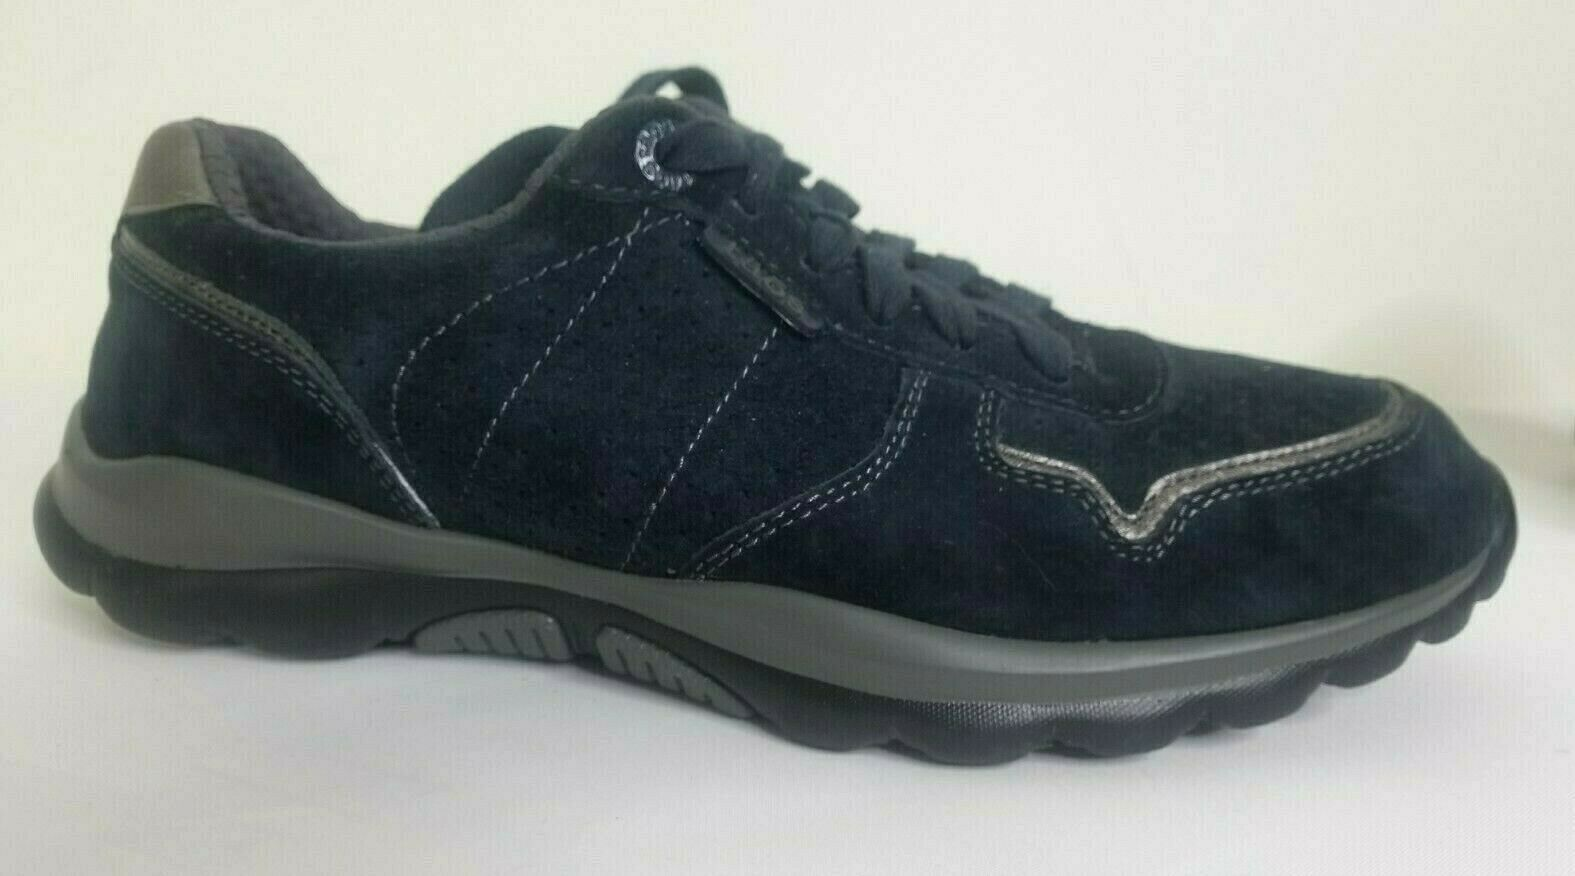 Taos Lifestyle Dark Blue Sneakers Women's 7.5 Shoes